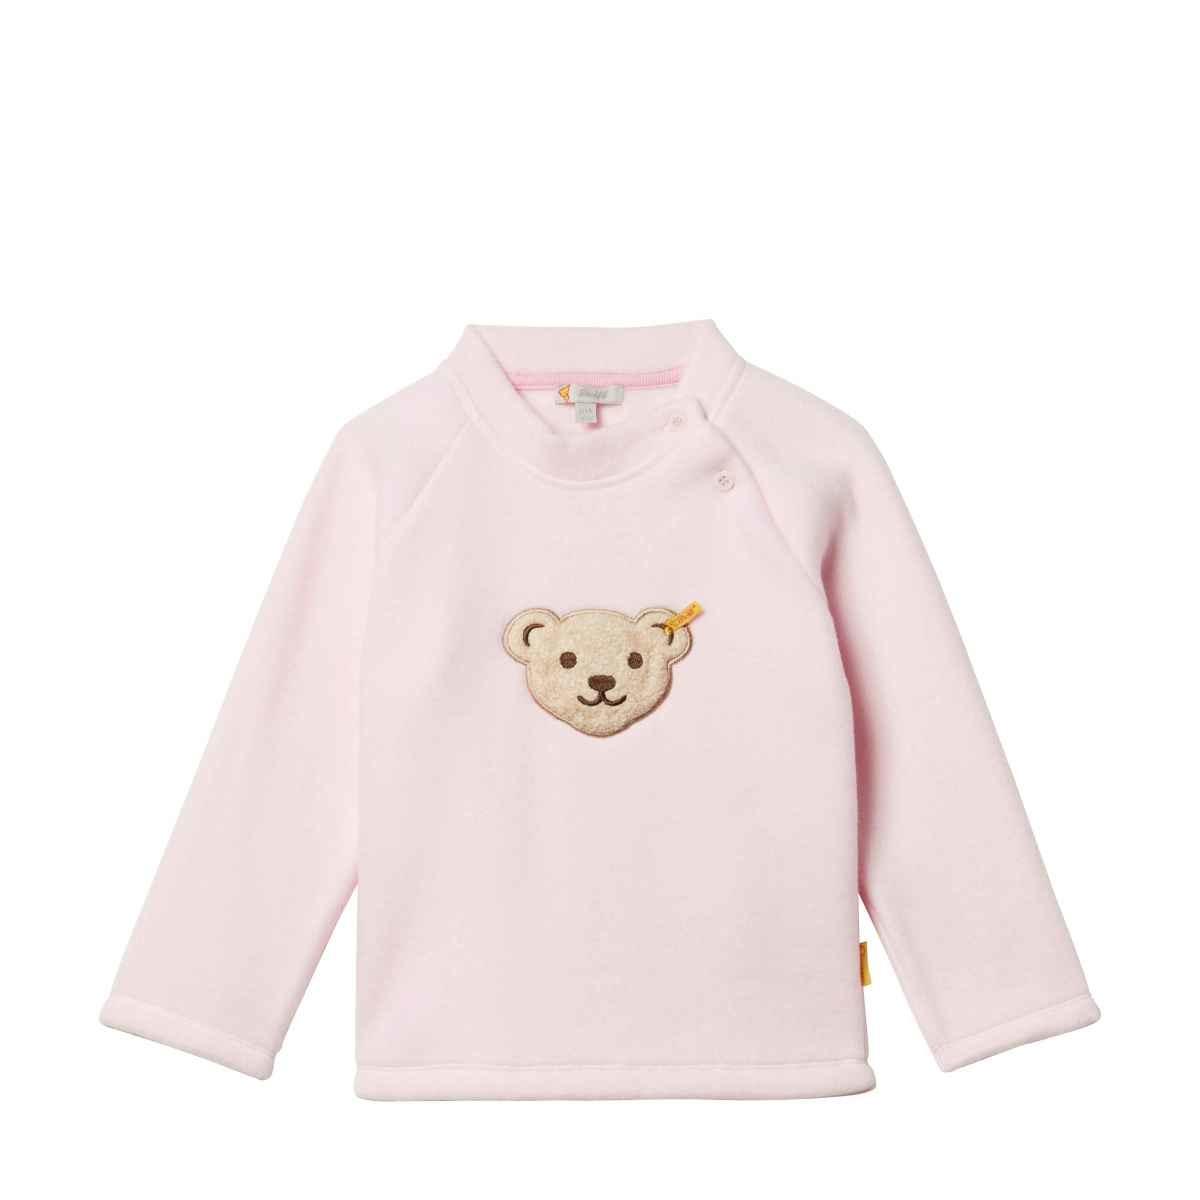 Steiff Steiff Pink Teddy Jumper